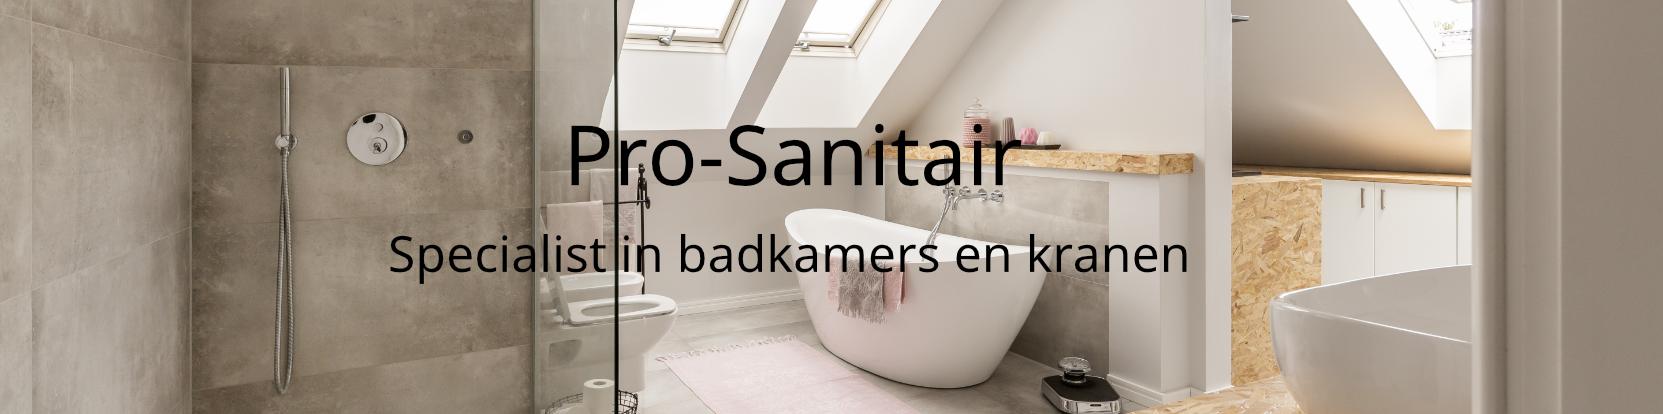 Pro-sanitair - specialist inbadkamers en kranen